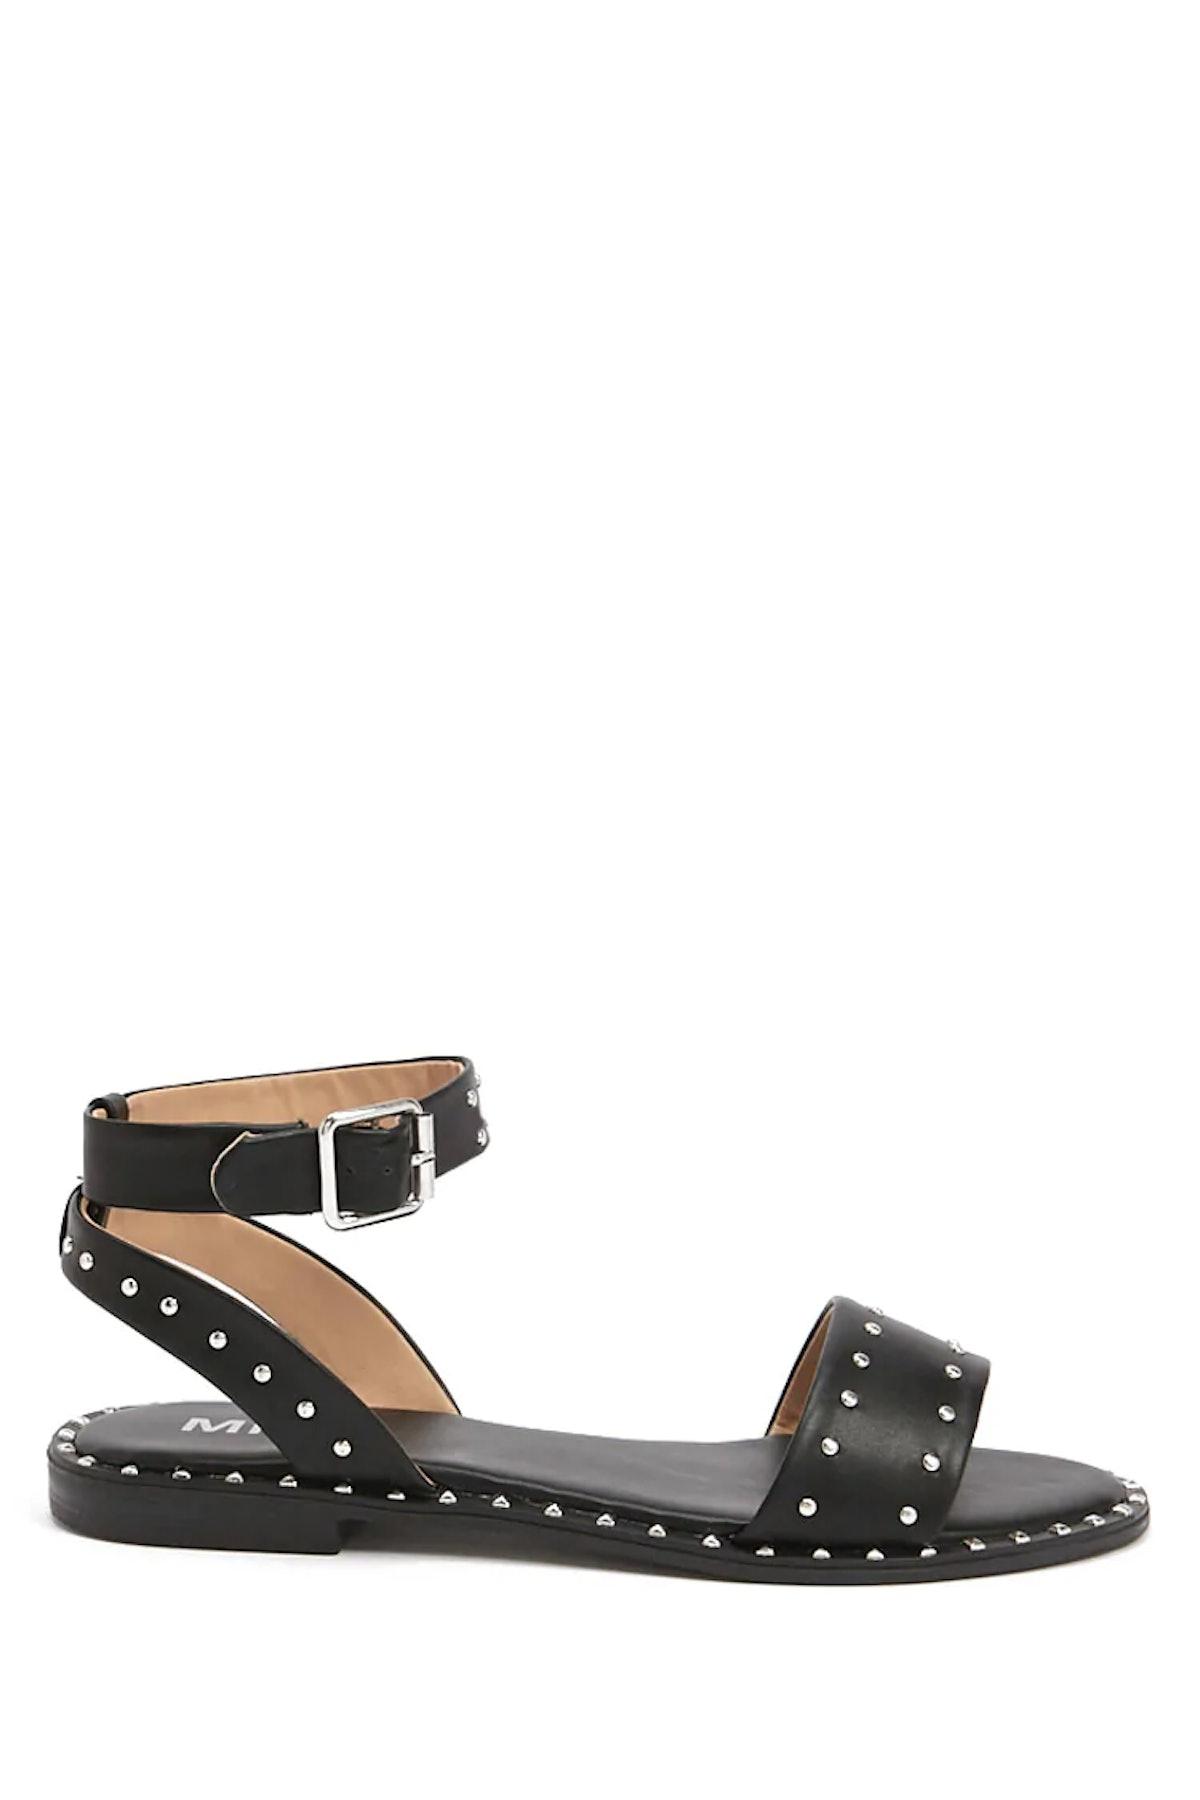 MIA Studded Sandals